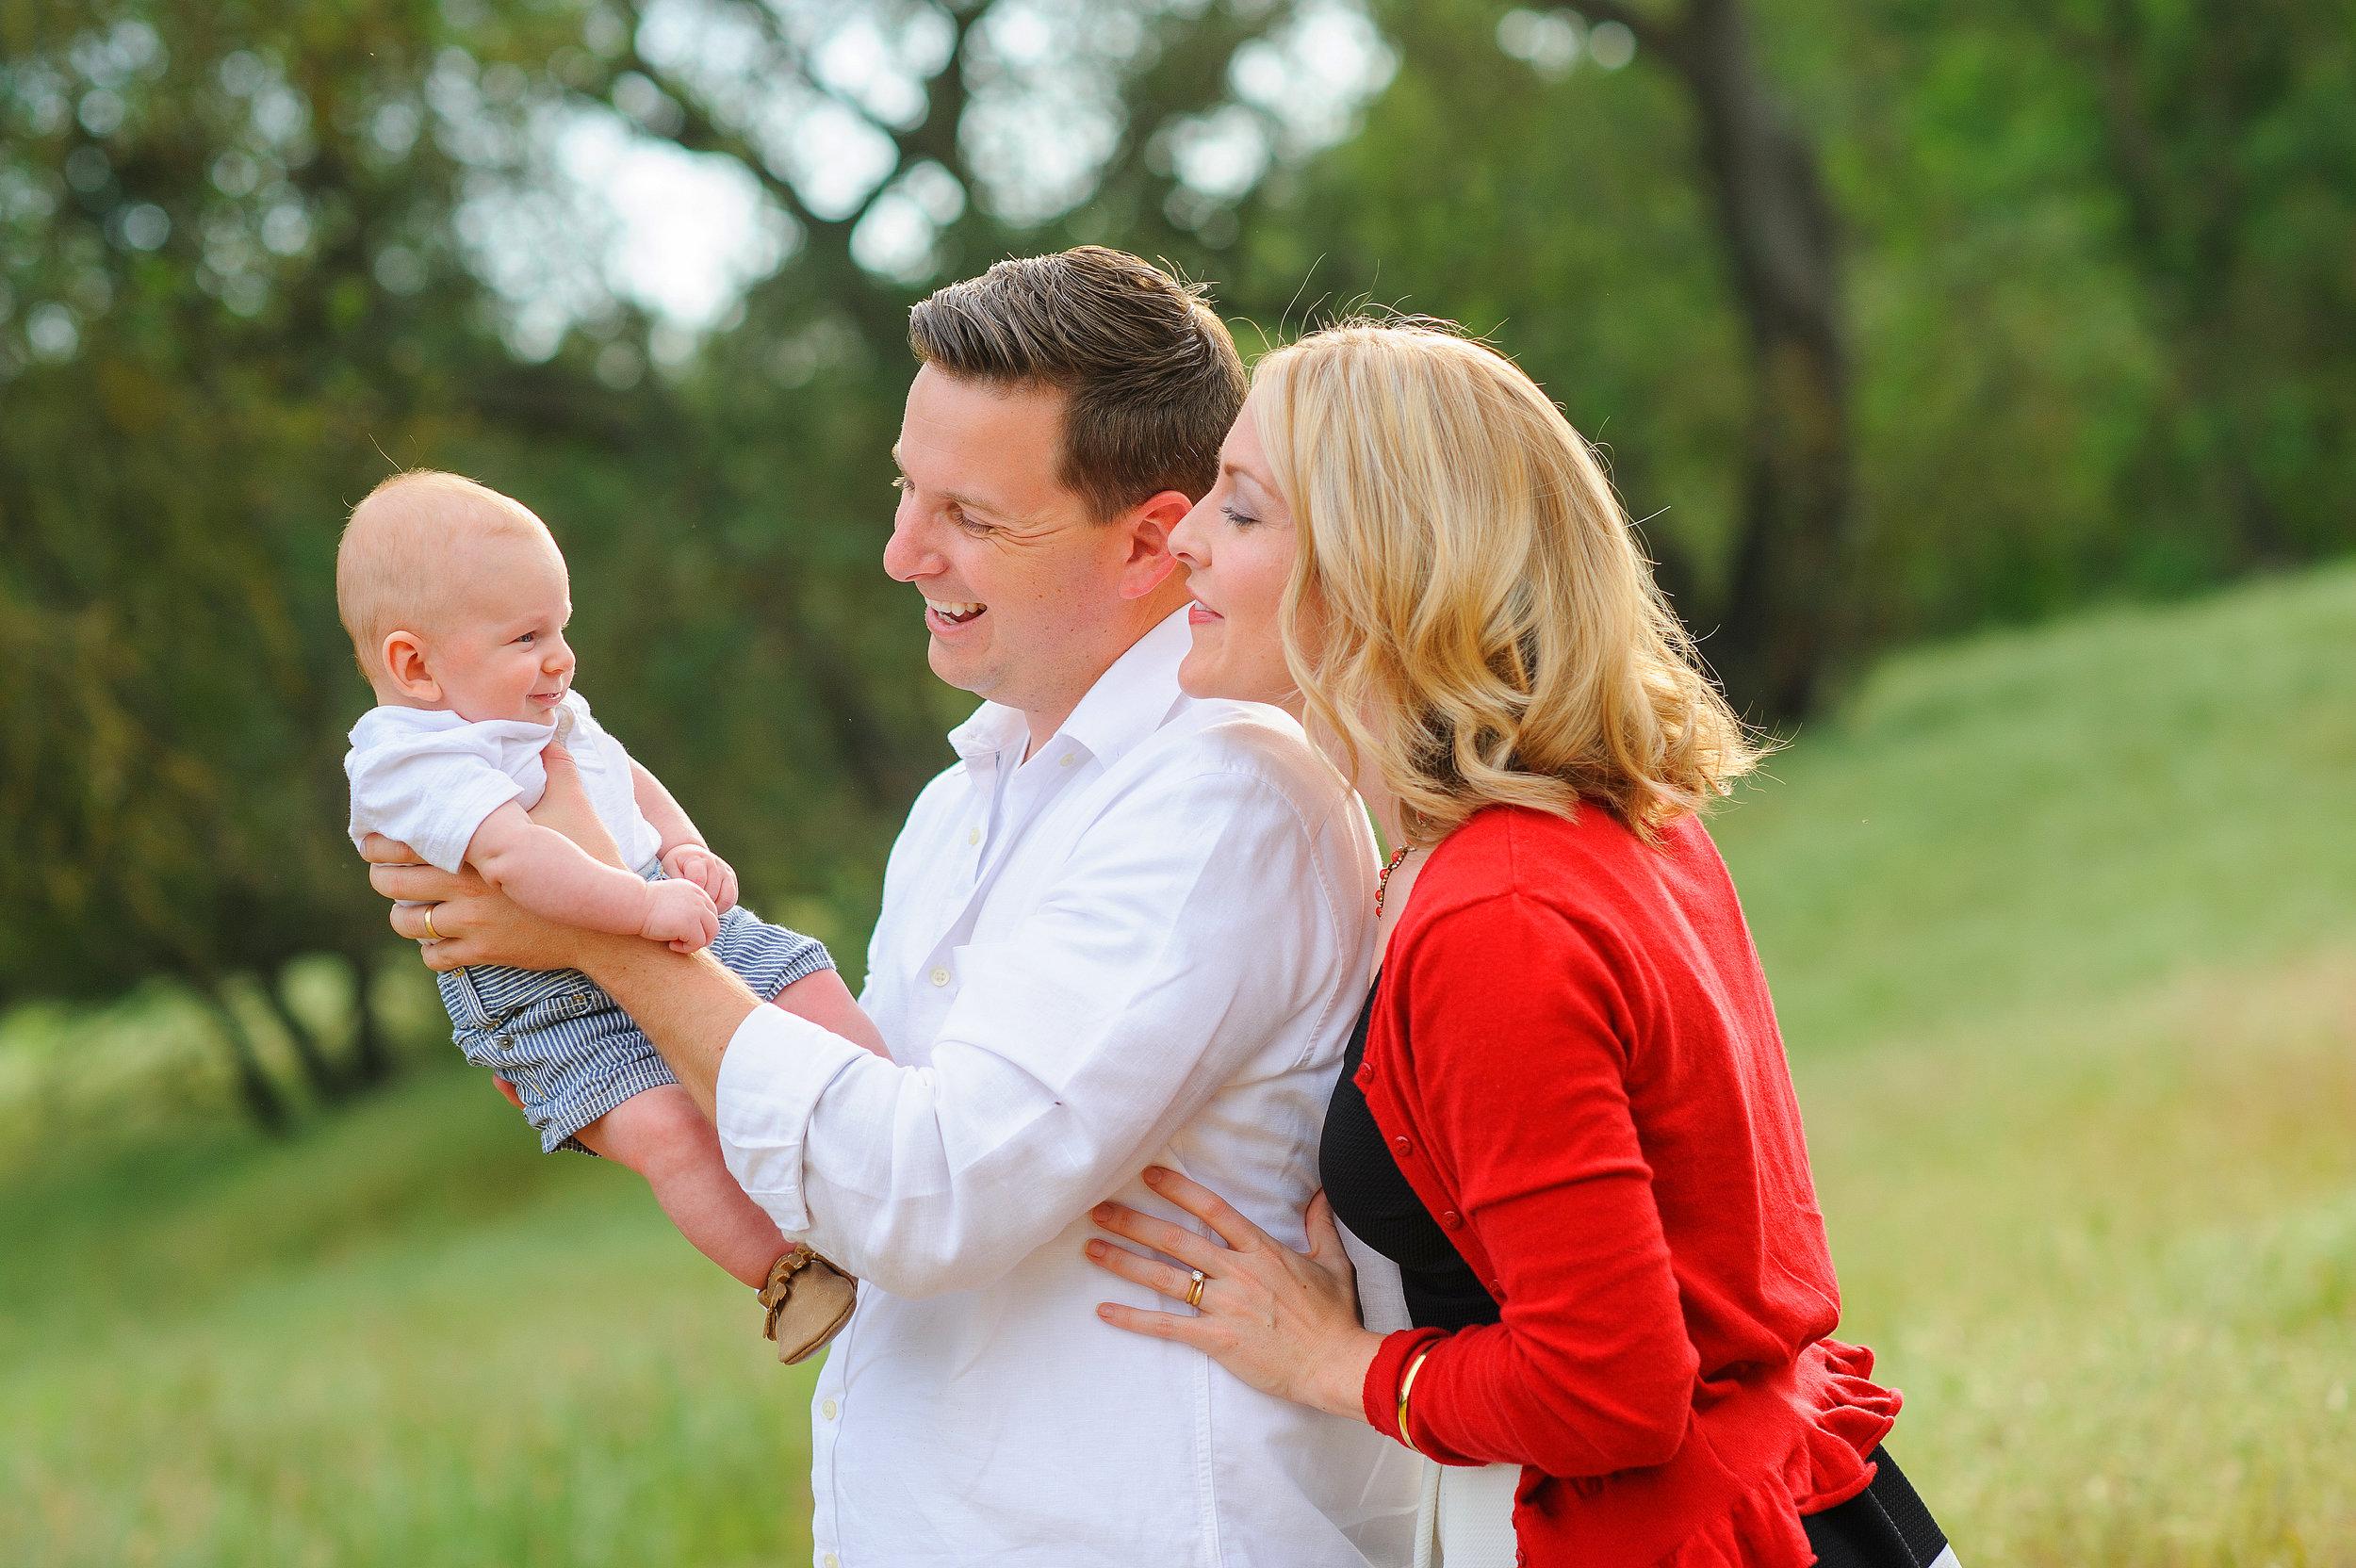 erickson-family-007-sacramento-family-photographer-katherine-nicole-photography.JPG